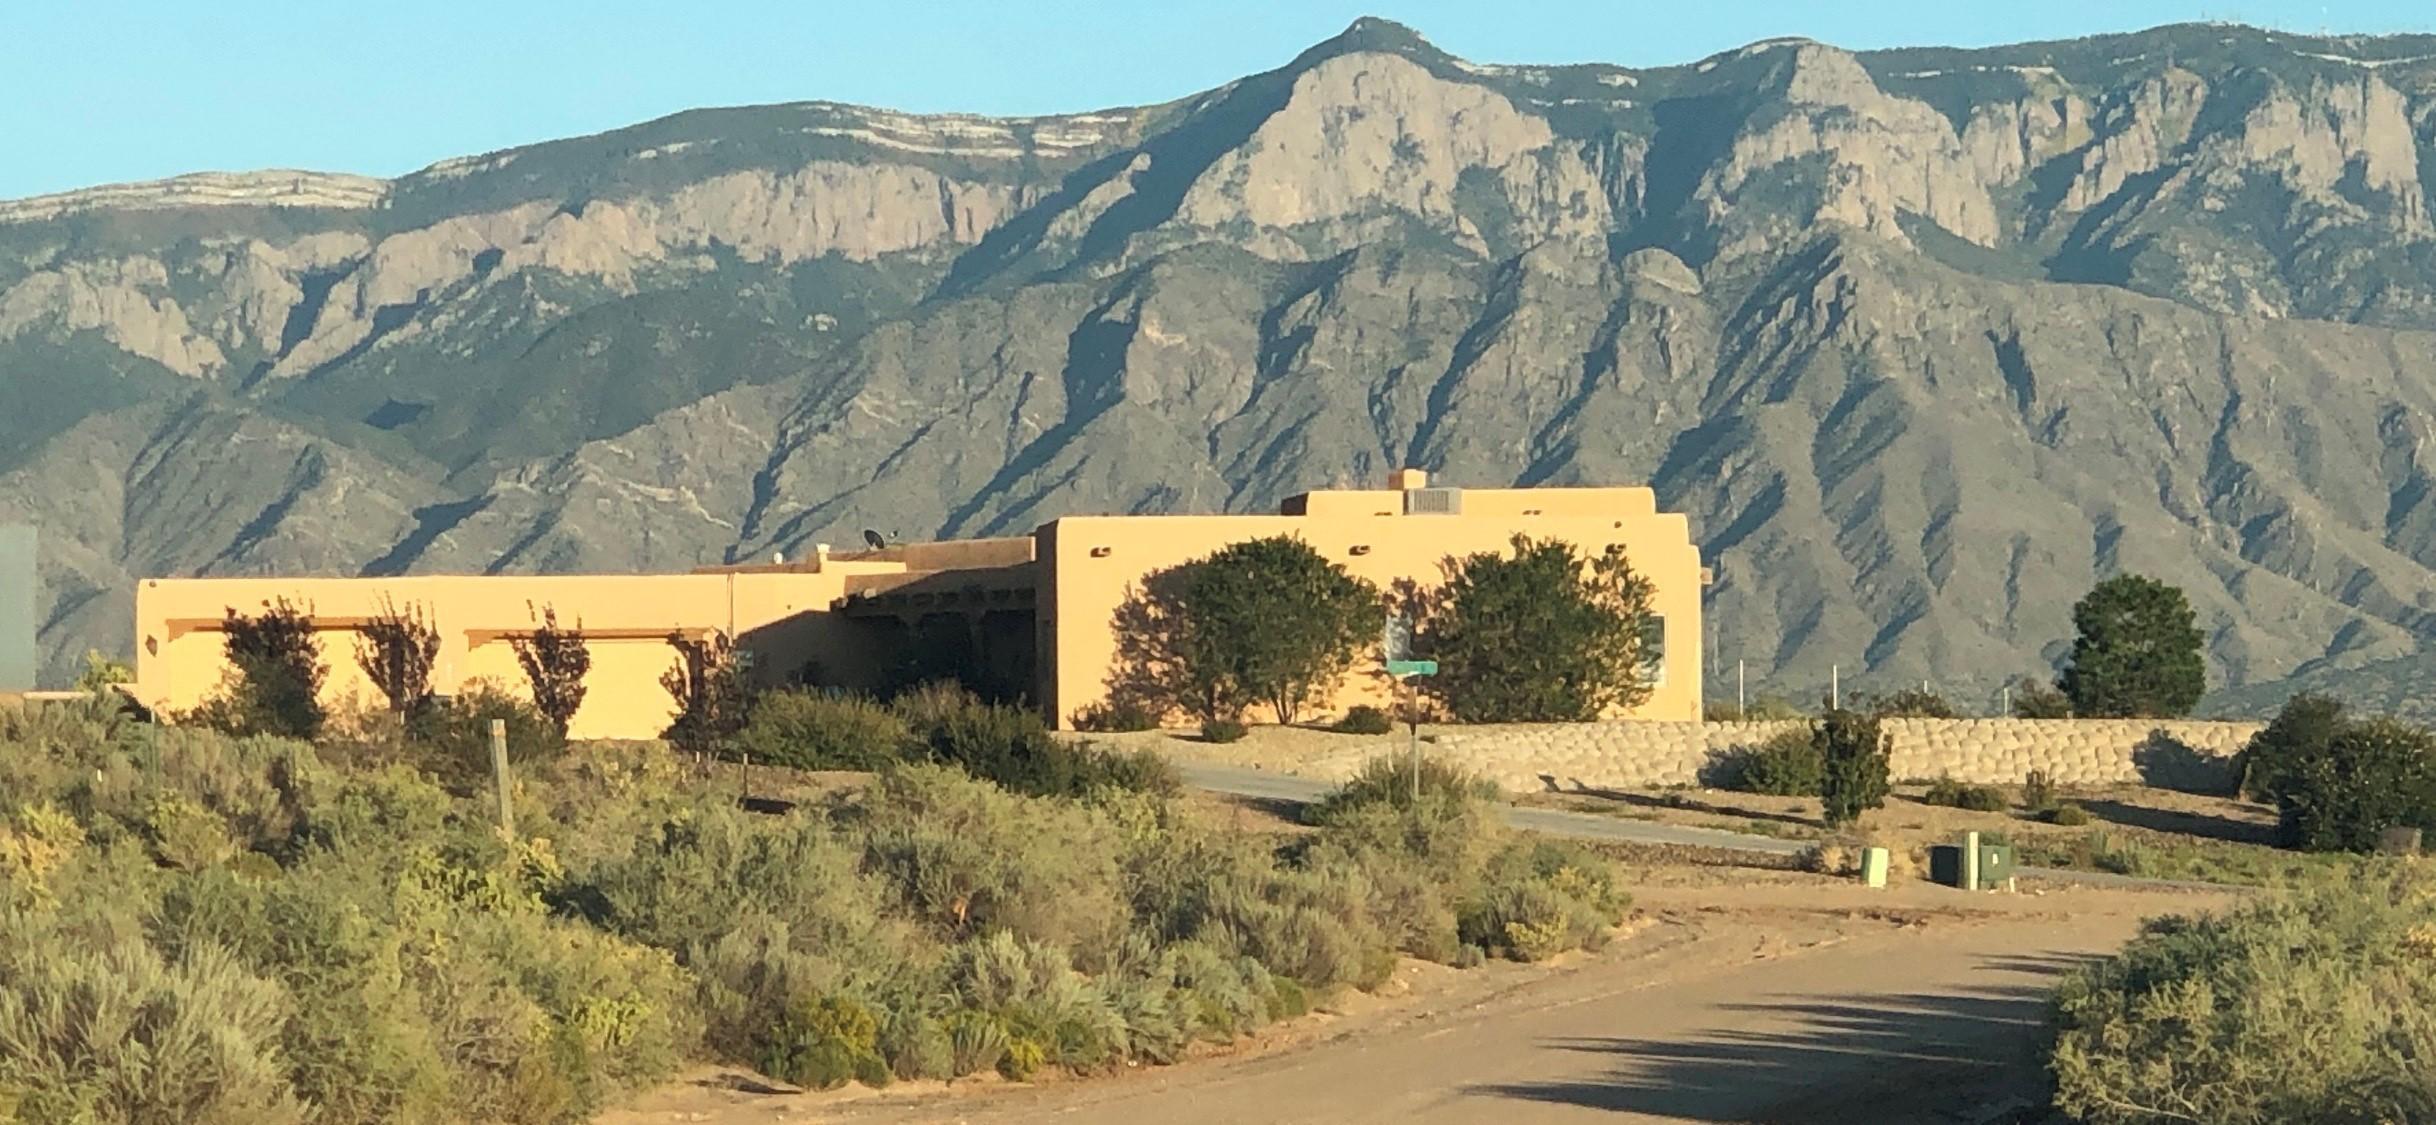 1420 GROS VENTRE Drive NE, Rio Rancho, NM 87144 - Rio Rancho, NM real estate listing